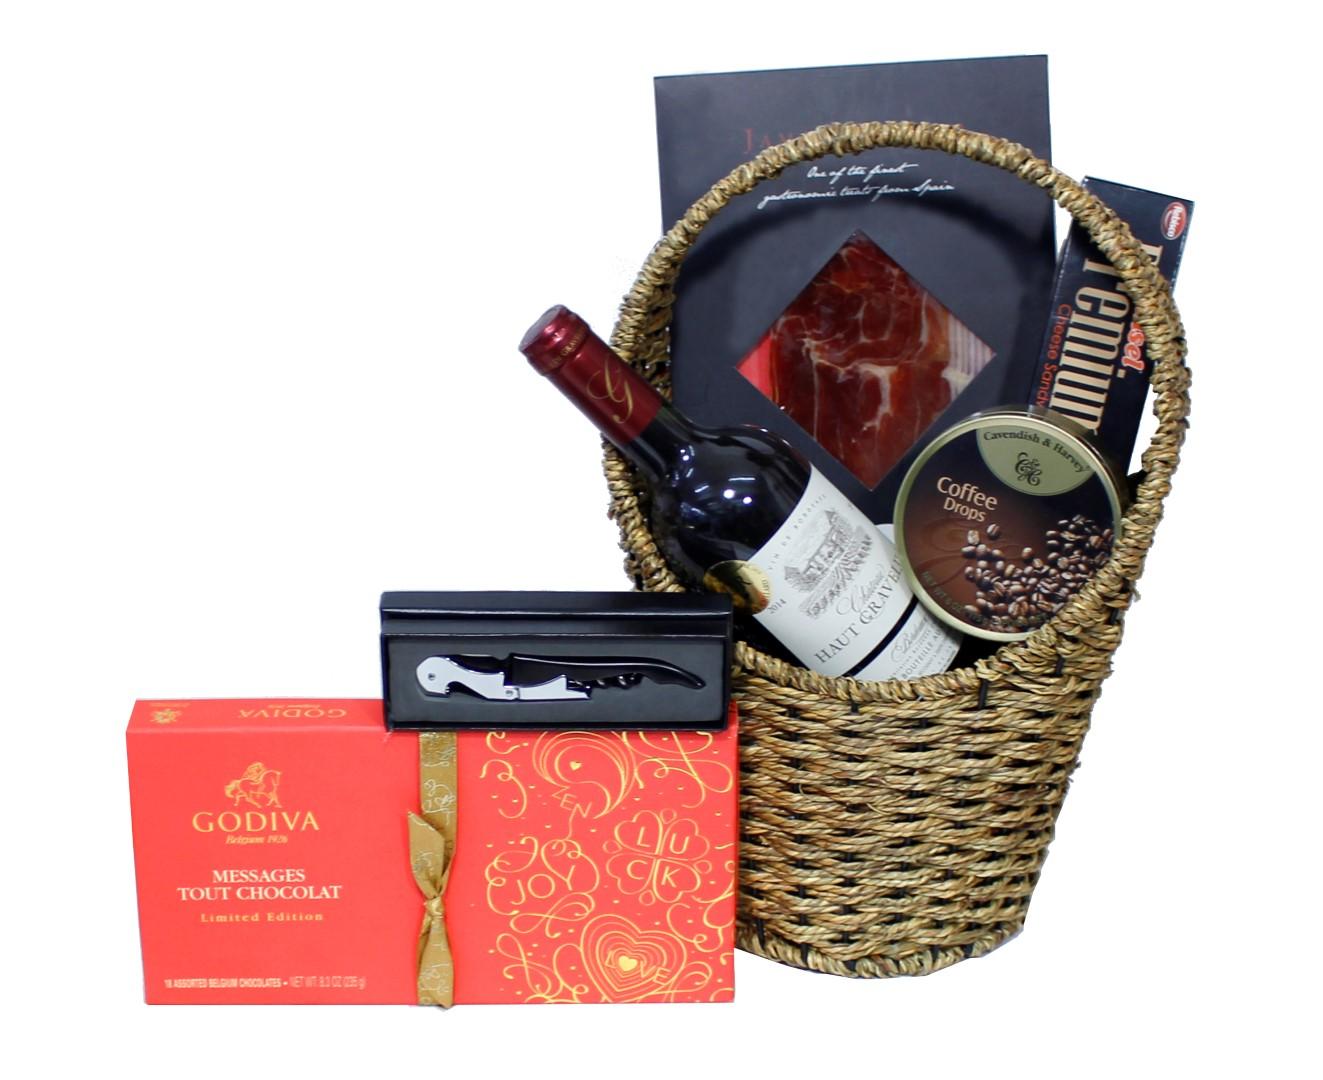 Godiva & Ham Gifts Food Basket 31